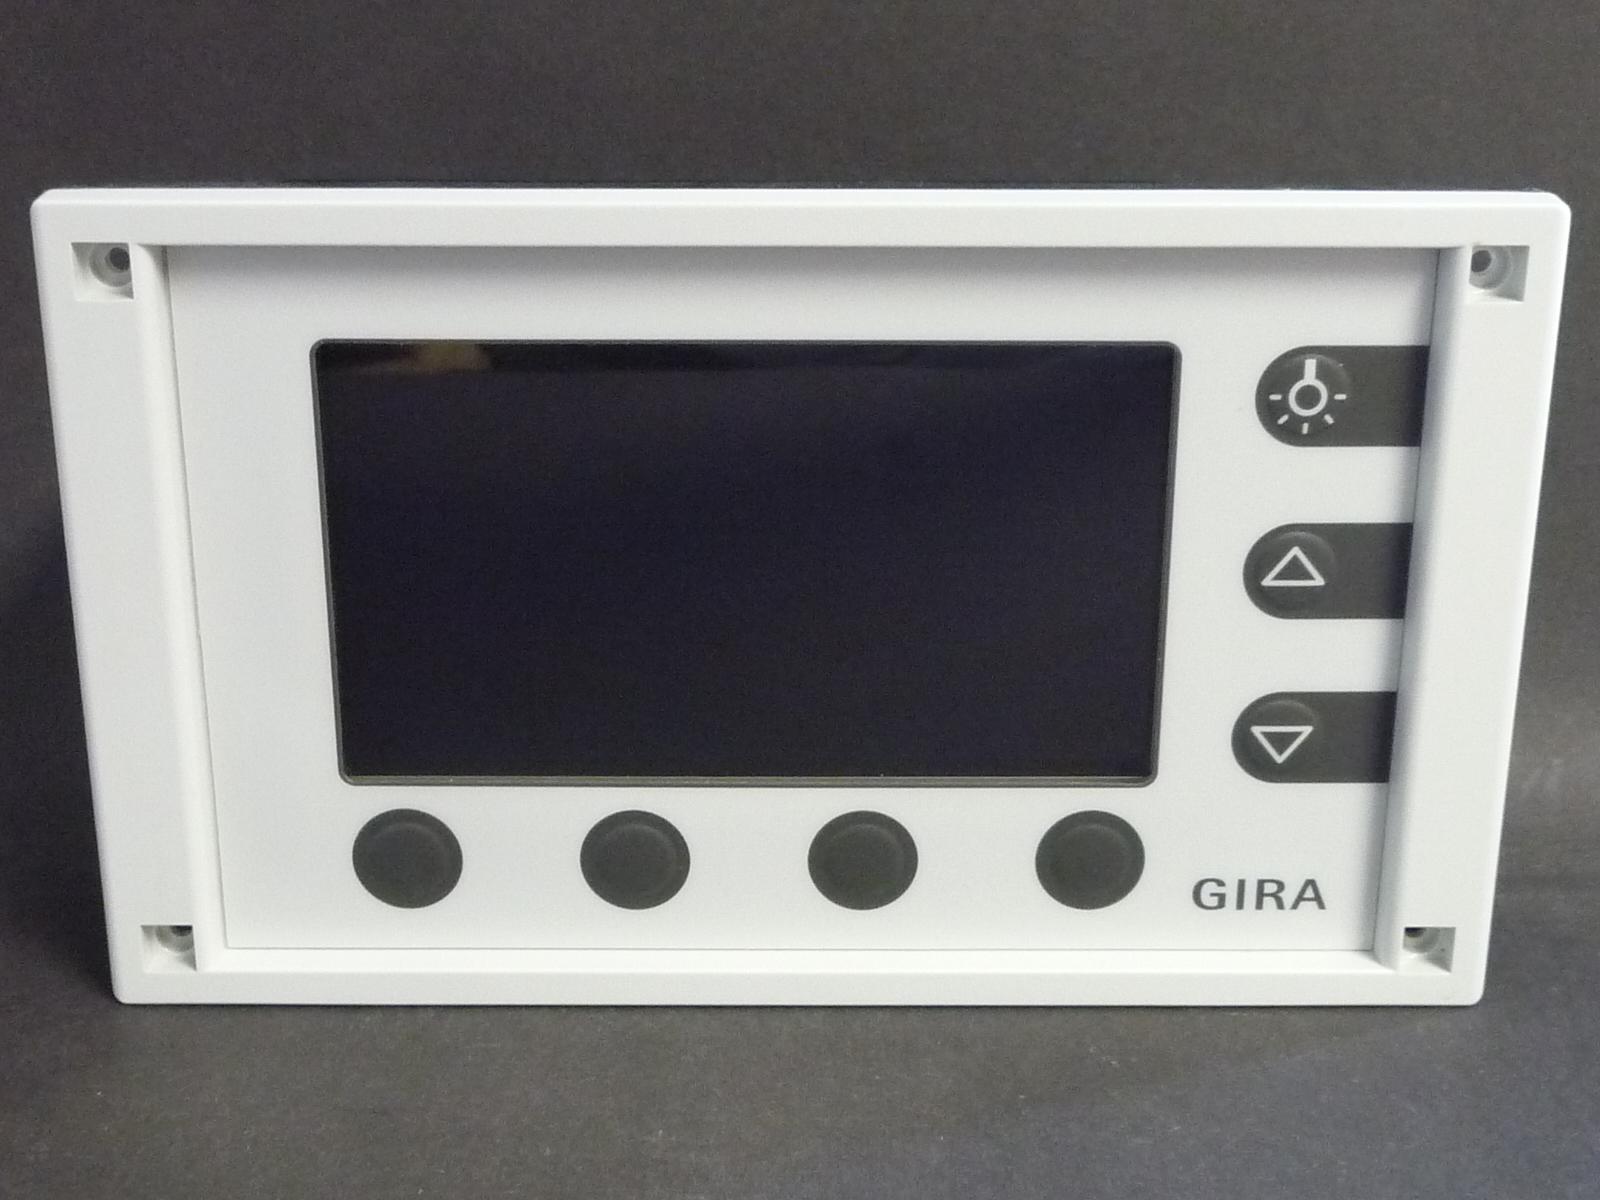 gira eib knx minitableau bedientableau lcd display mt 701 inkl geh use rahmen ebay. Black Bedroom Furniture Sets. Home Design Ideas